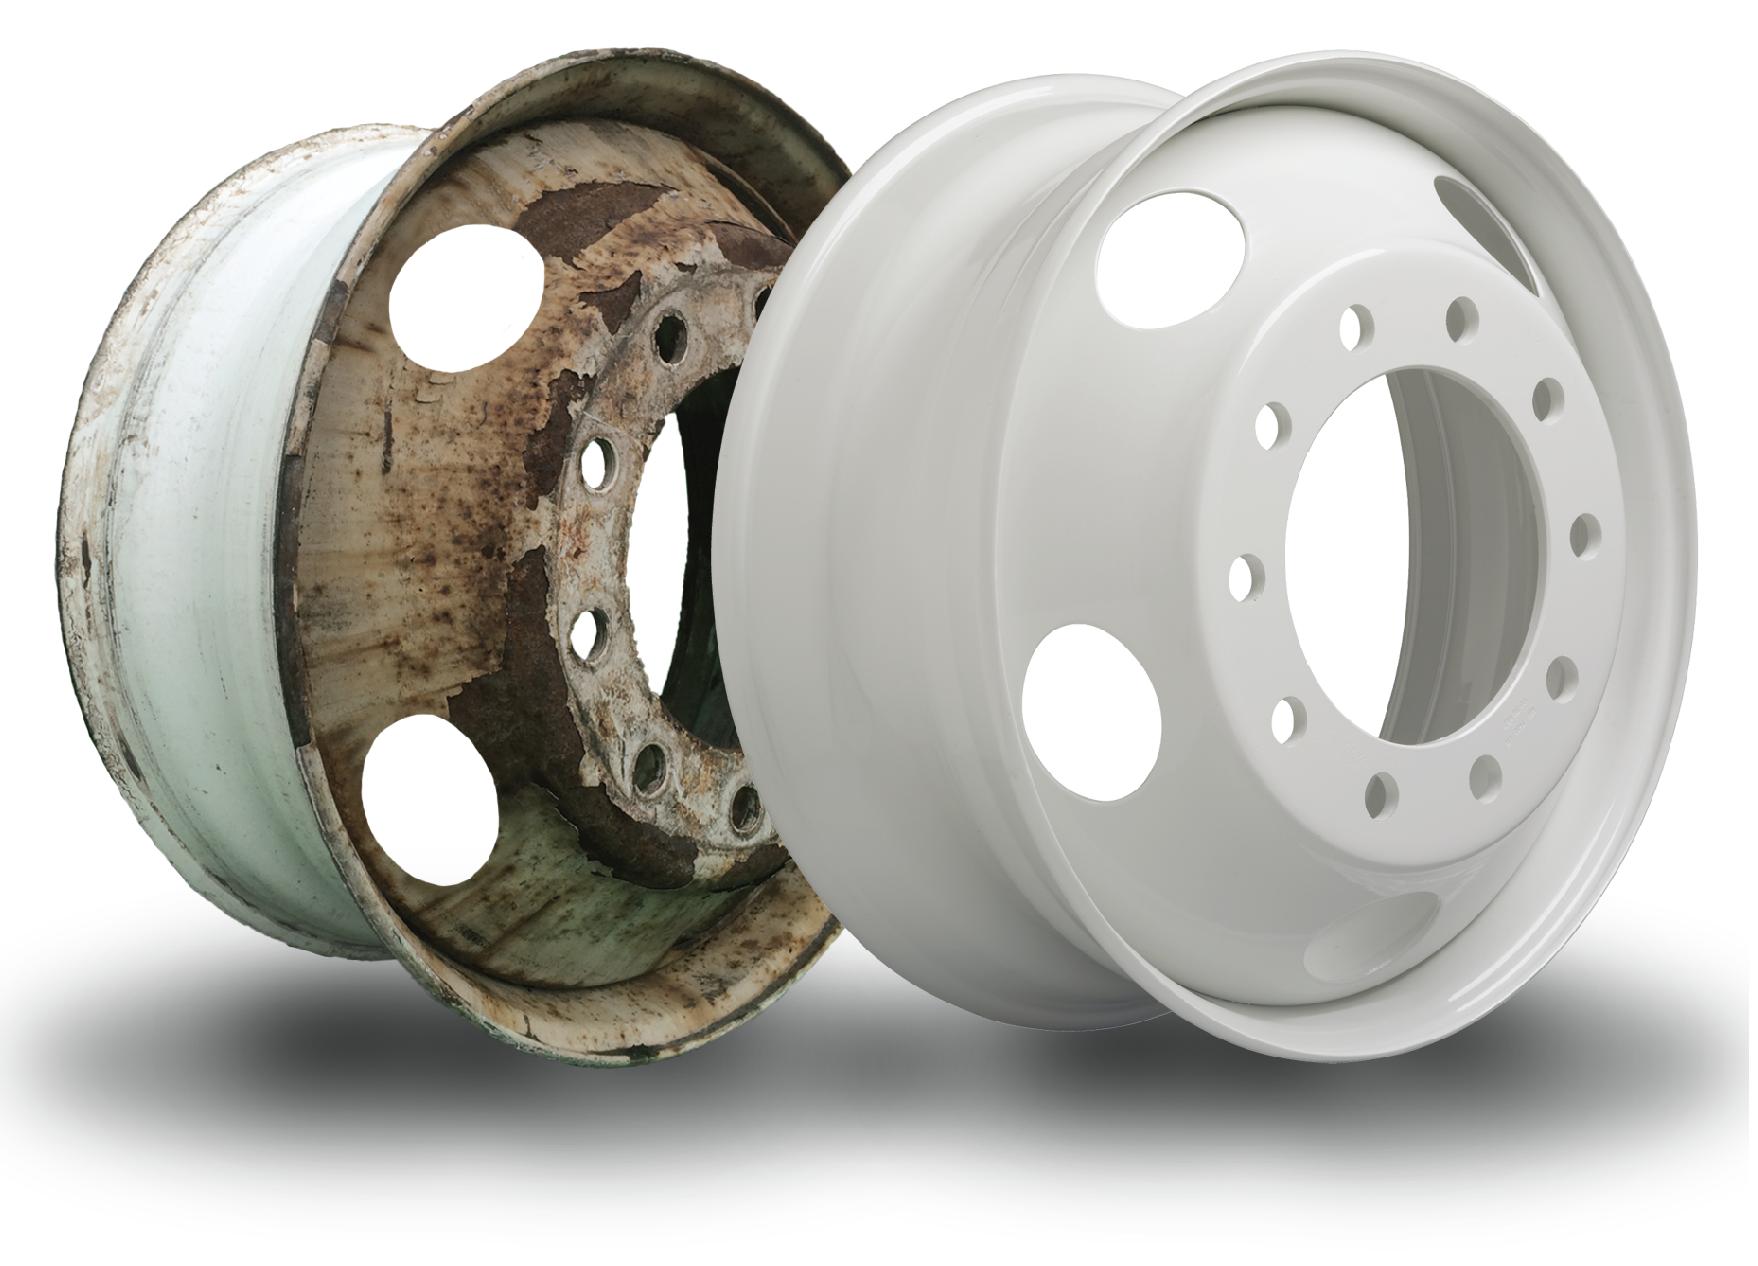 Accuride Launches ProFinish Steel Wheel Refinishing